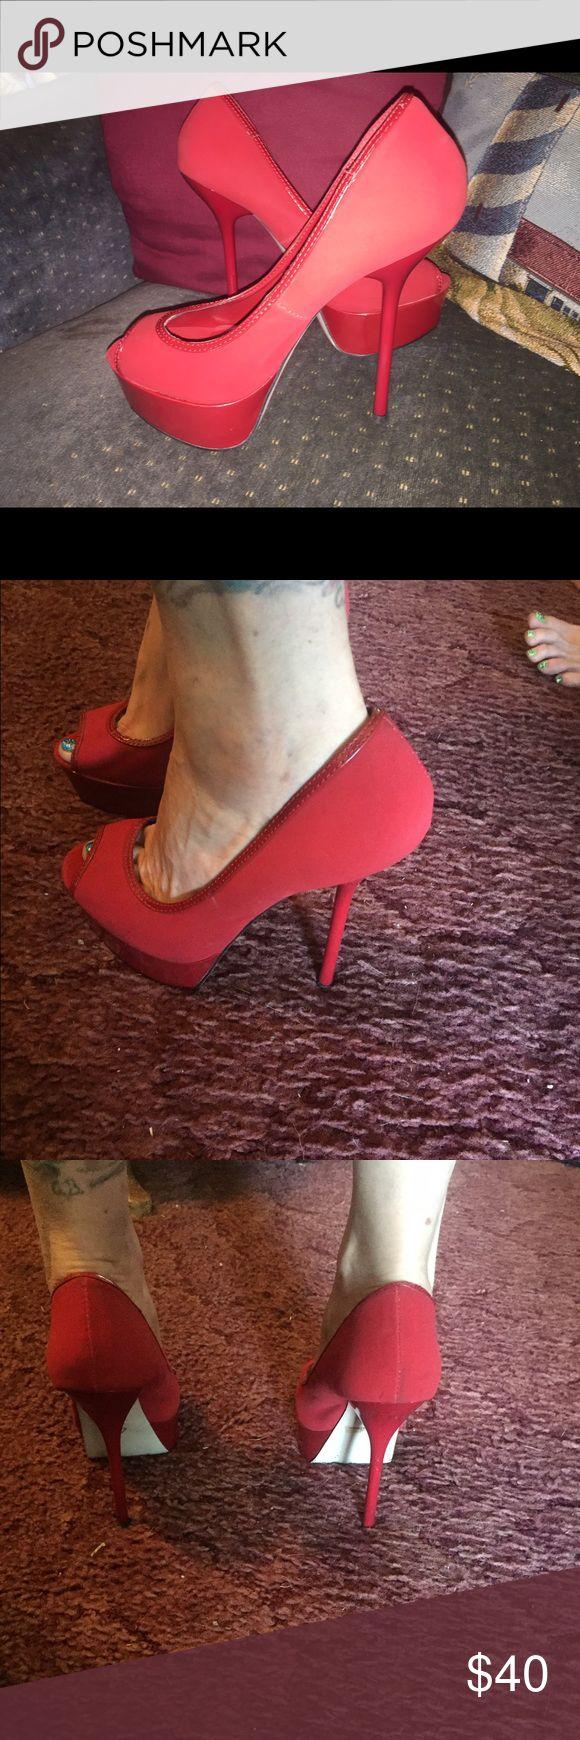 Penny & Kenny* Red stilettos size 8.5 Sexy red stilettos, size 8.5, by Penny & Kenny*....Gorgeous!💋 Penny & Kenny* Shoes Platforms